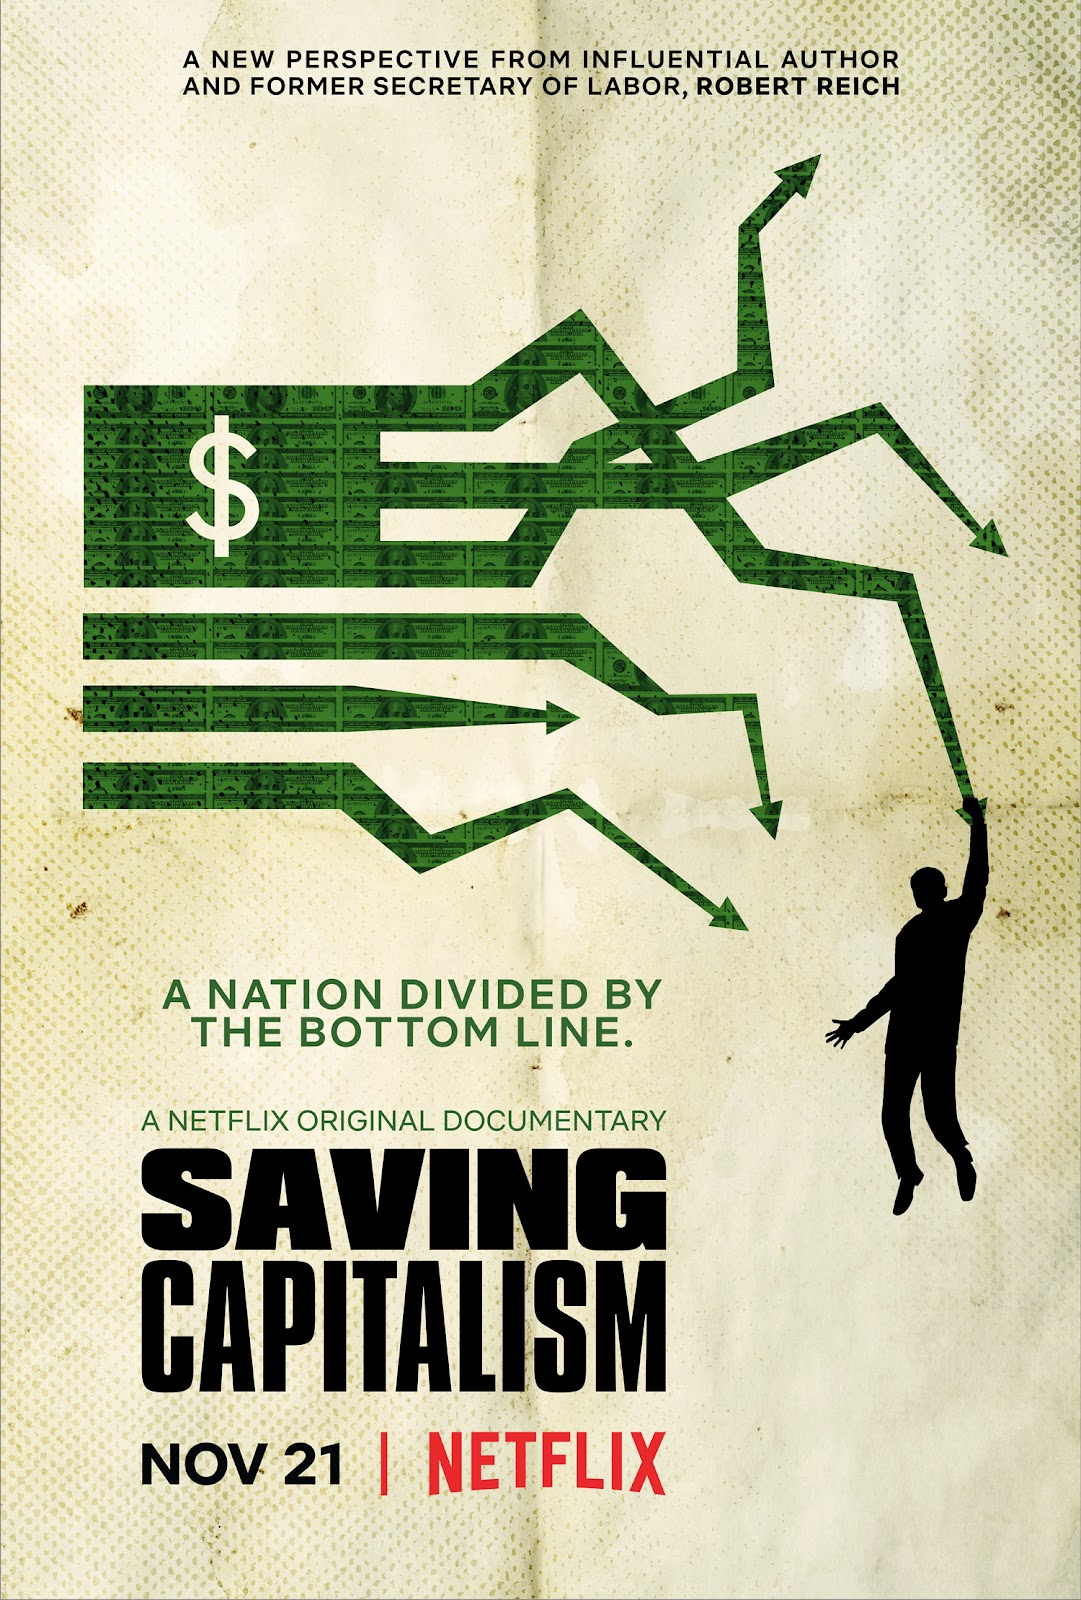 SavingCapitalism_Vertical-Main_RGB (2).jpg